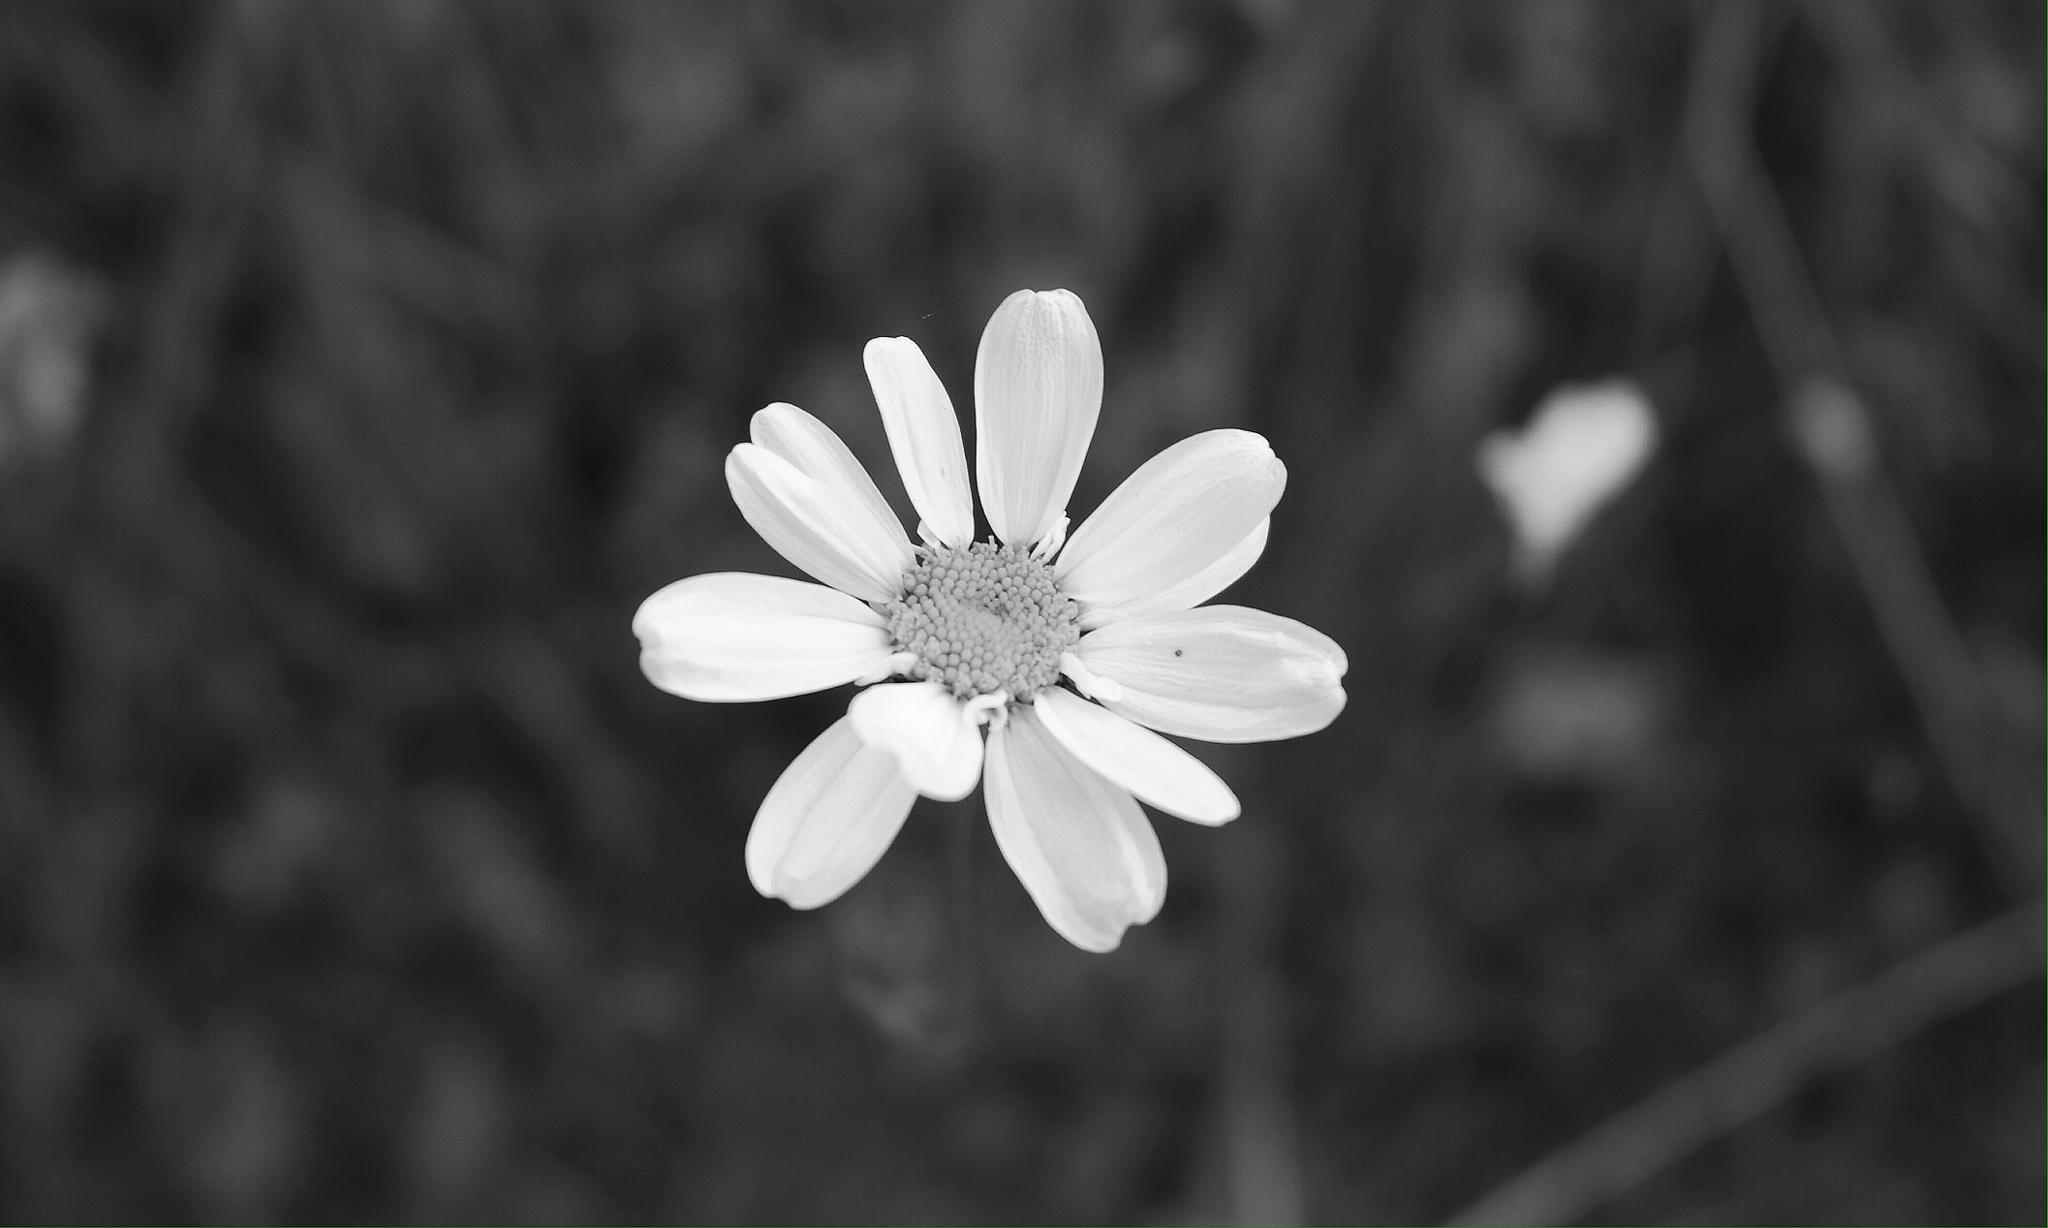 Simply Alone by ParisHavanna